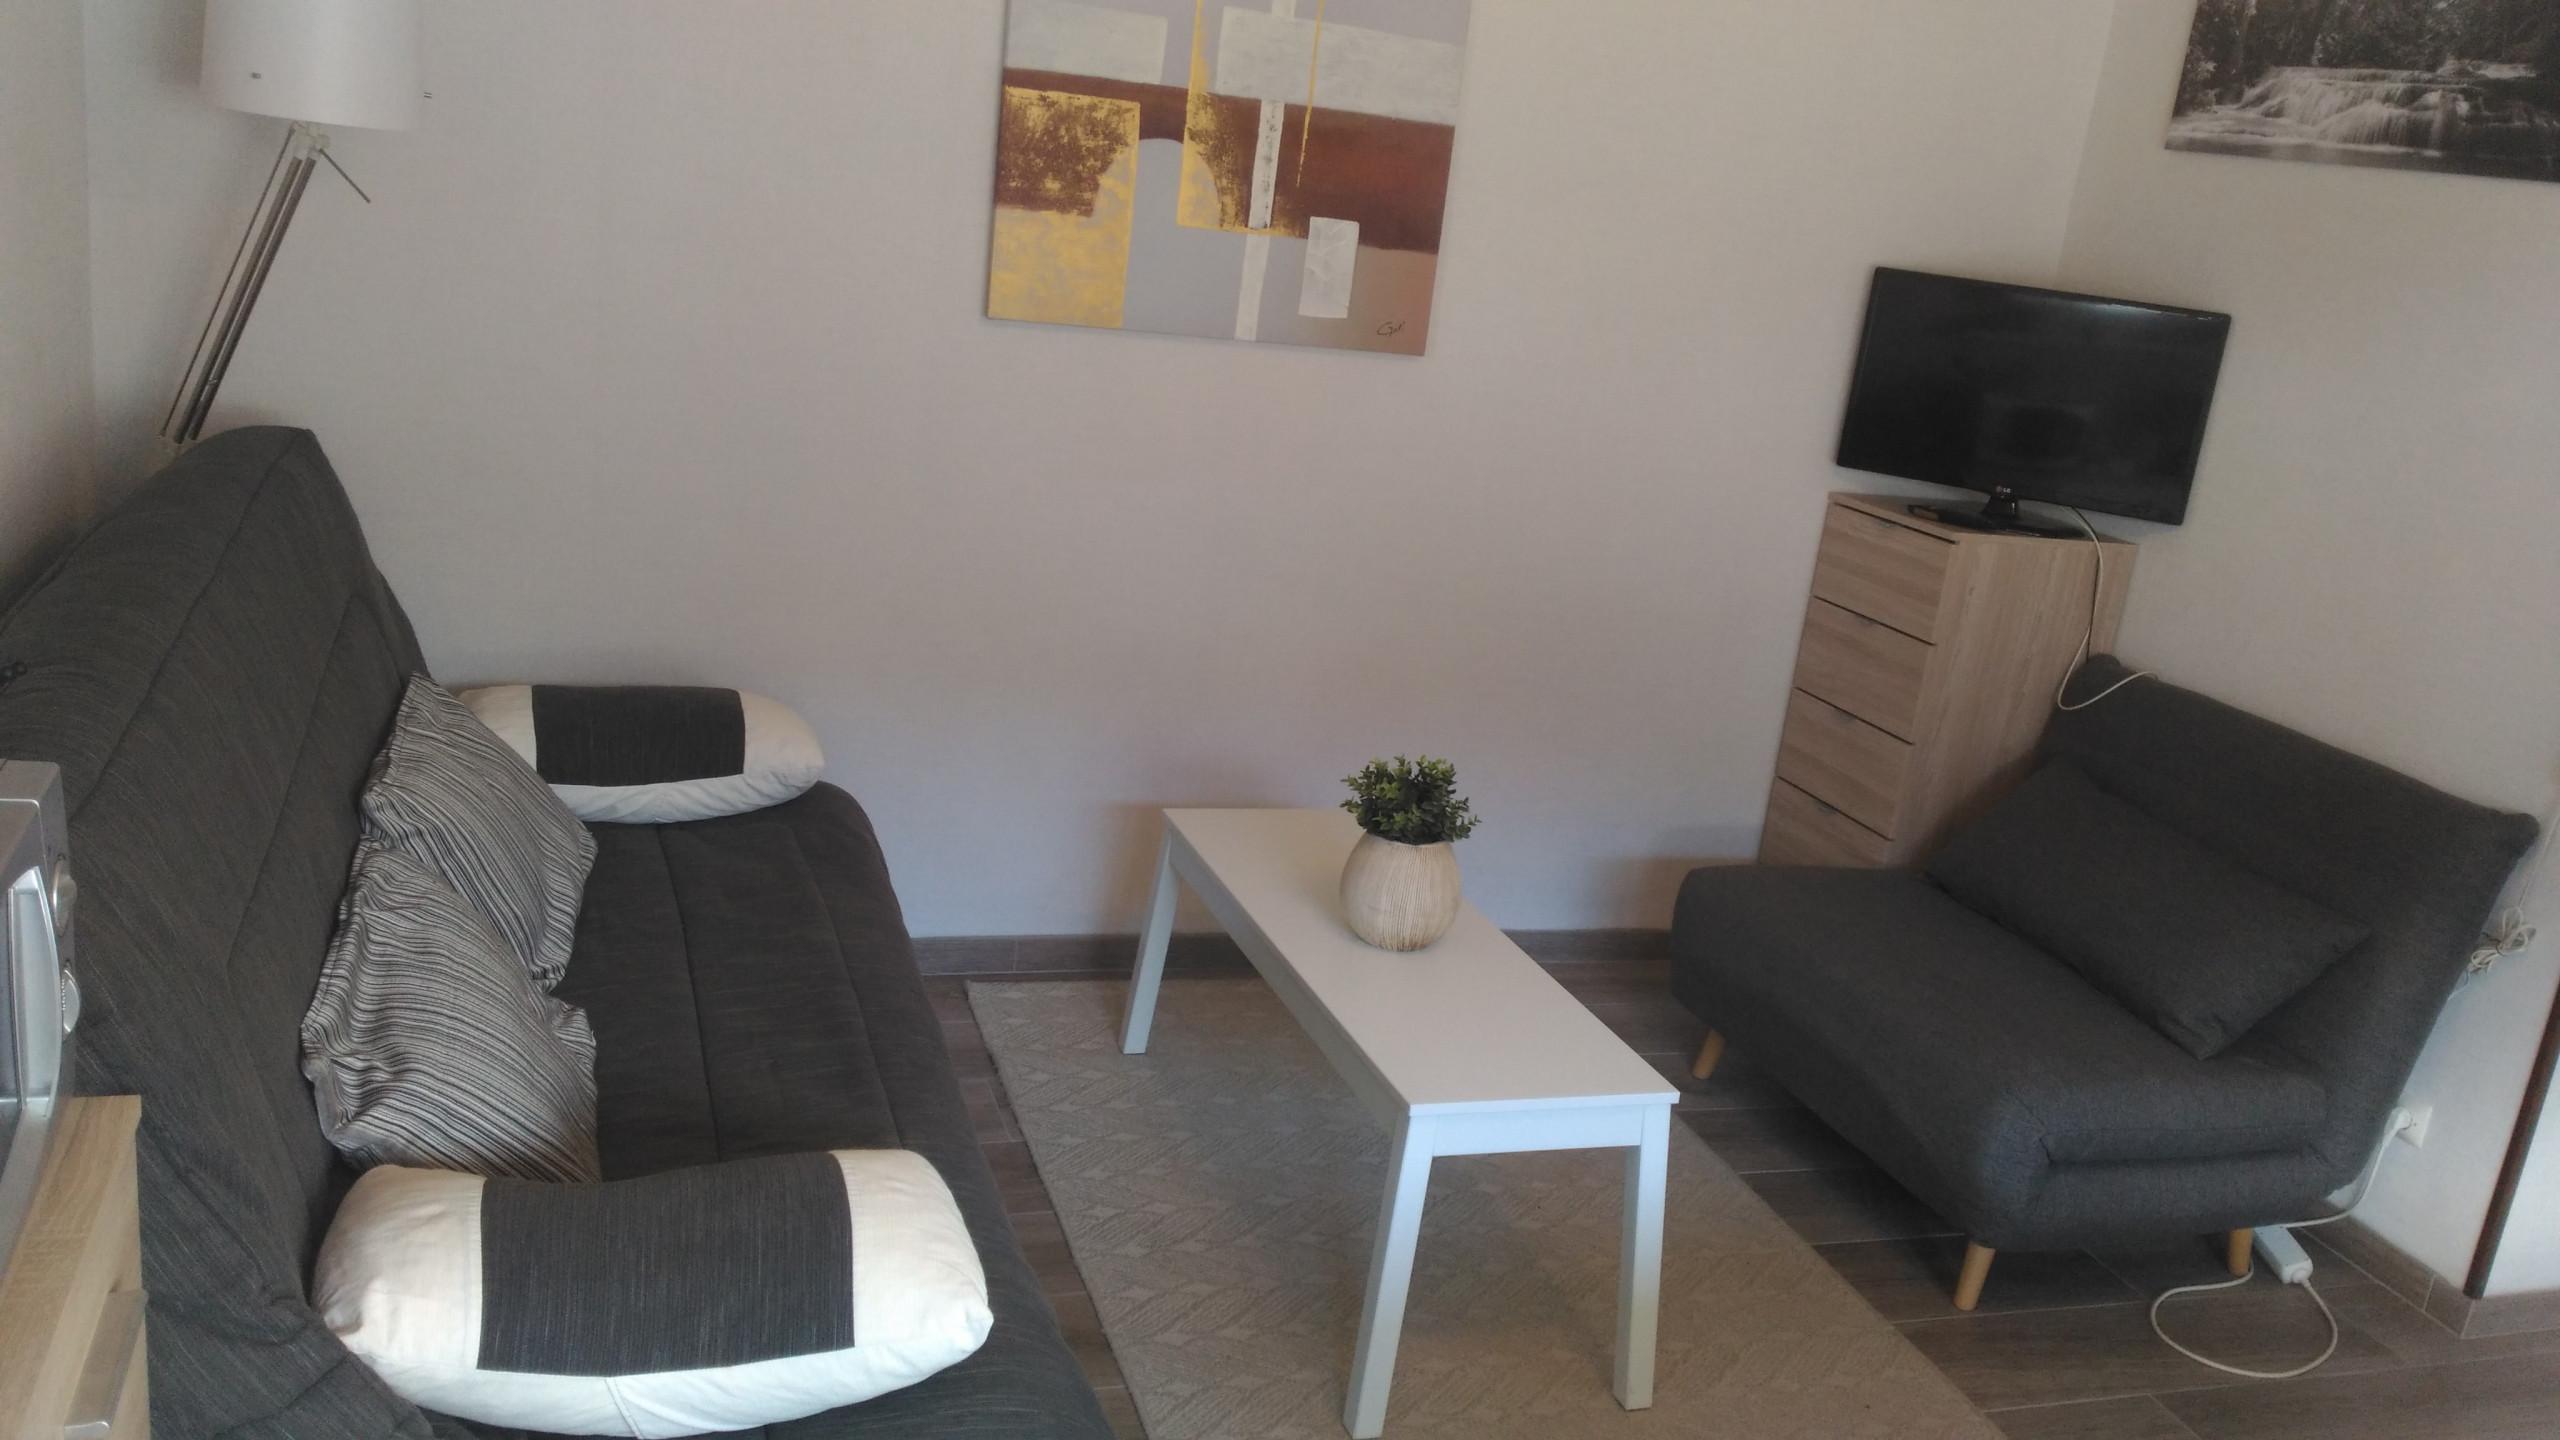 CA210 Studio 4 Pers centre des Carroz Accommodation in Les Carroz